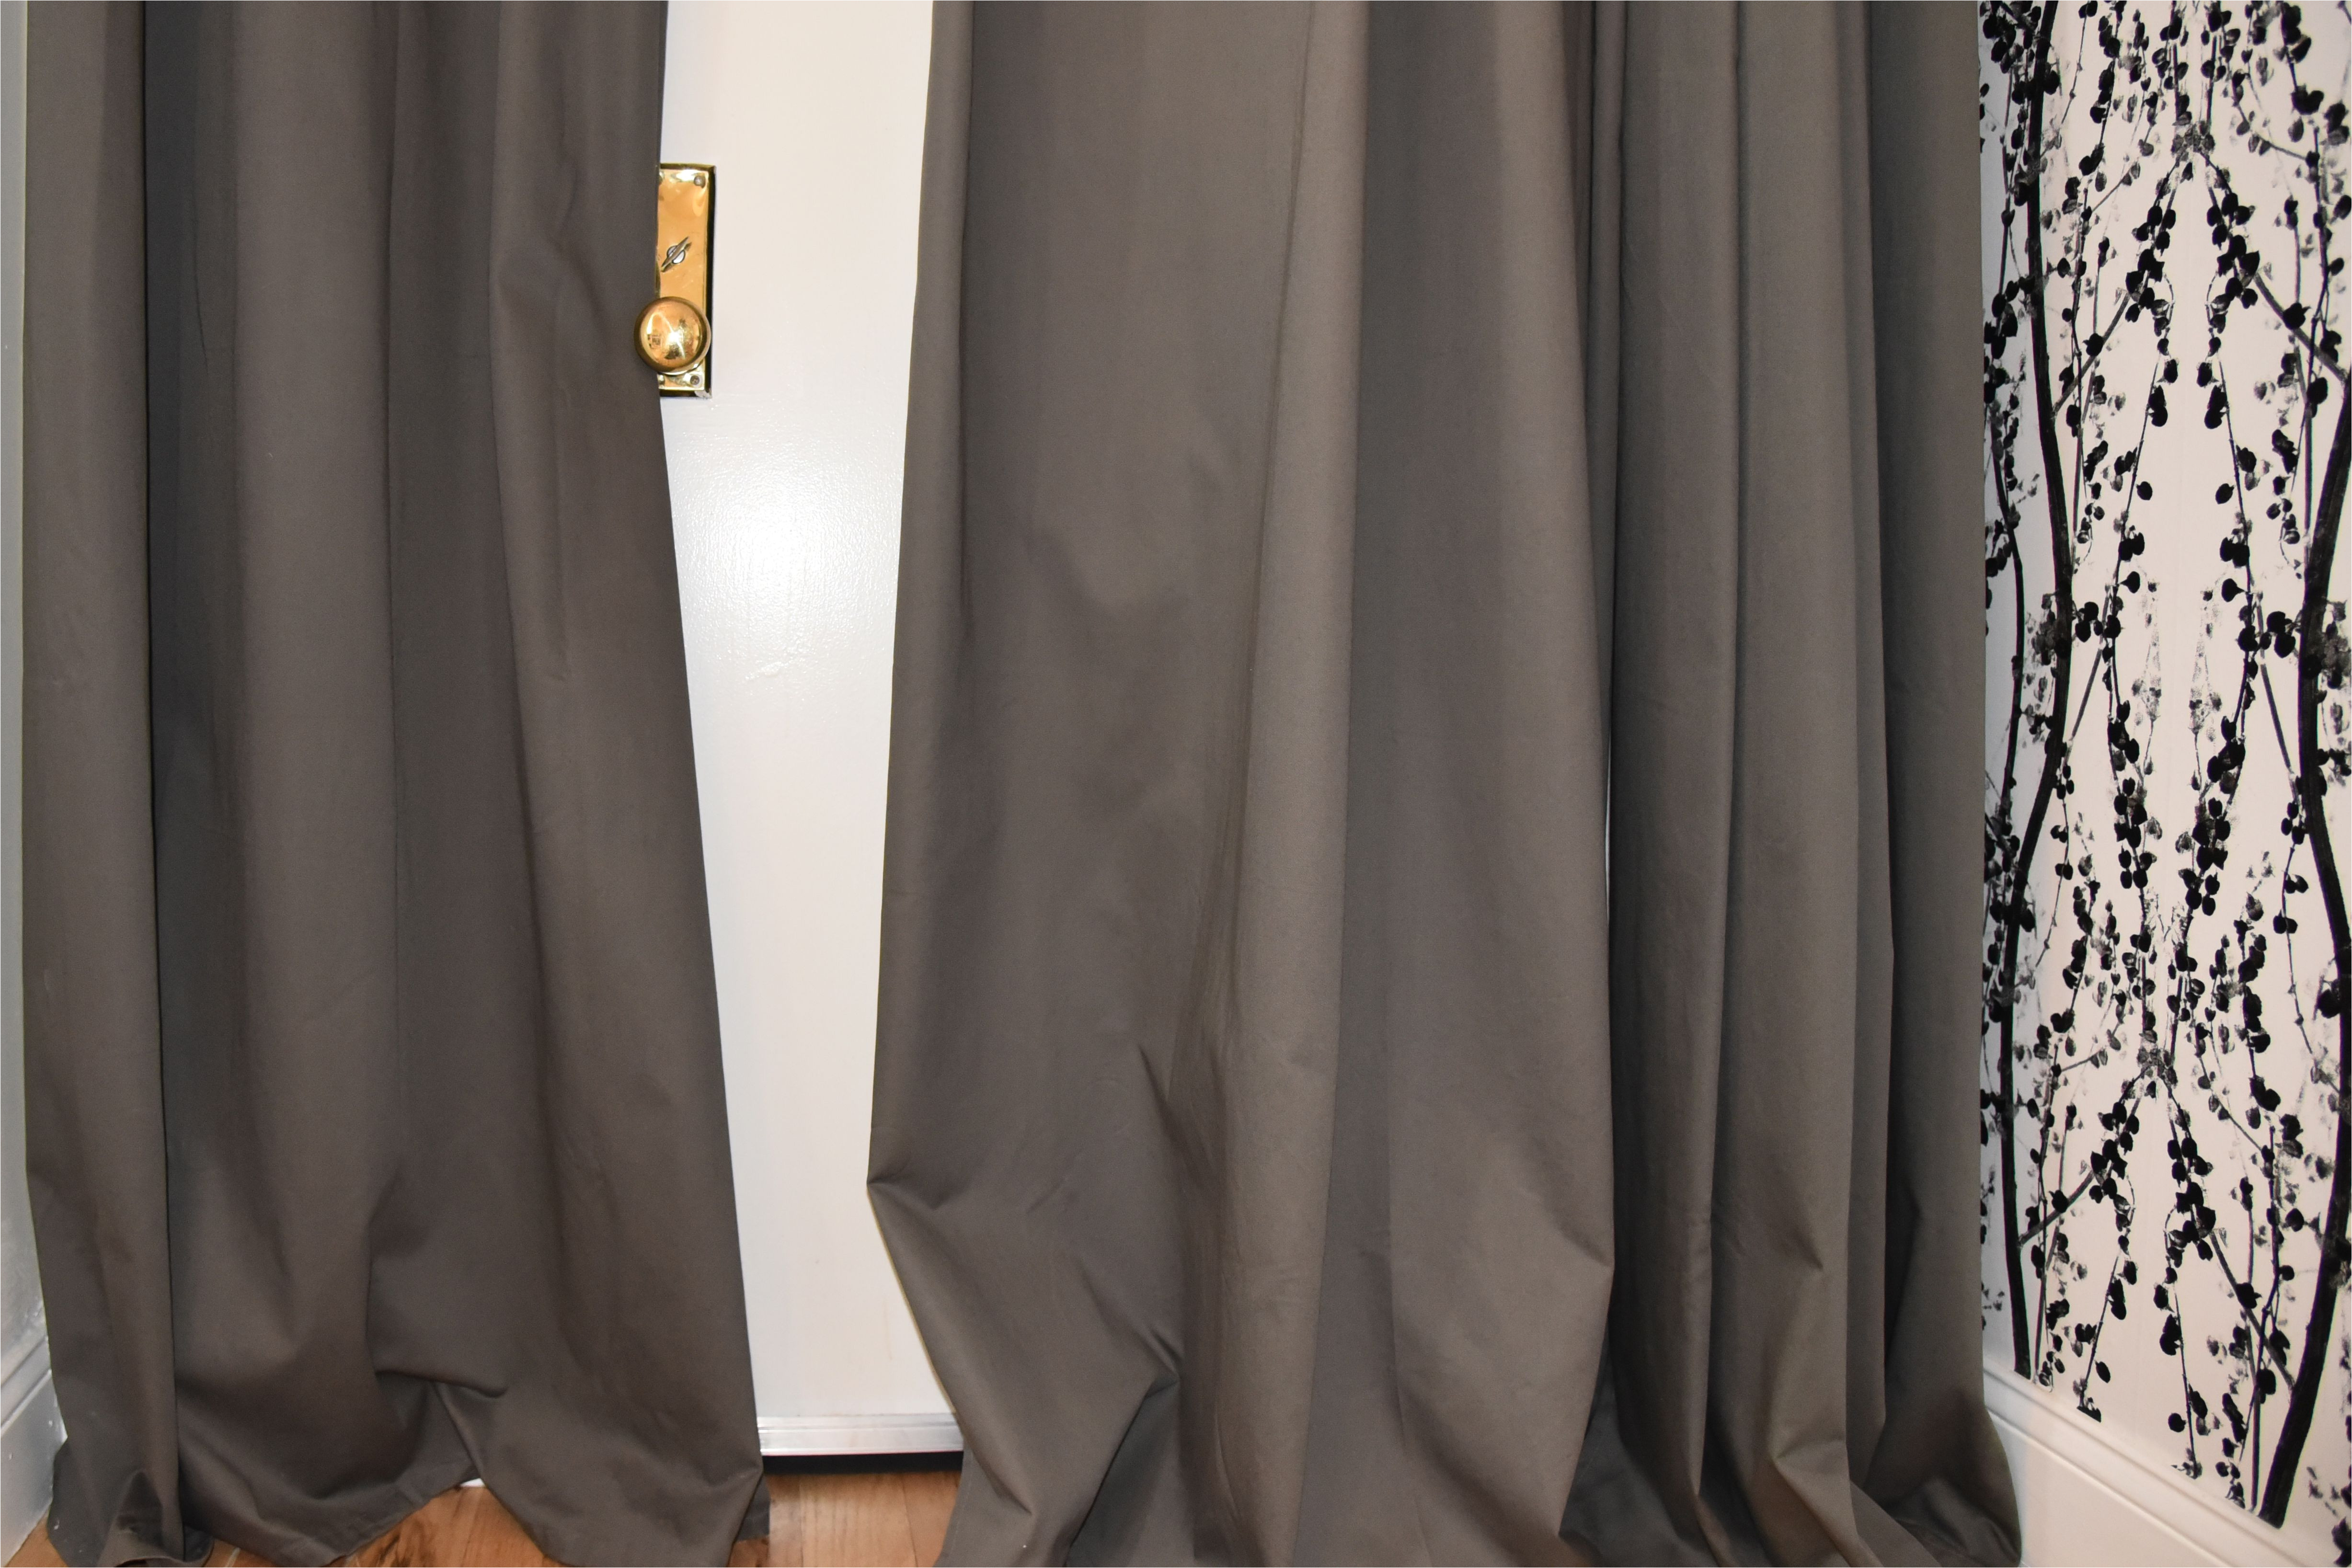 block noise with door curtain 590777425f9b5810dcbac794 jpg